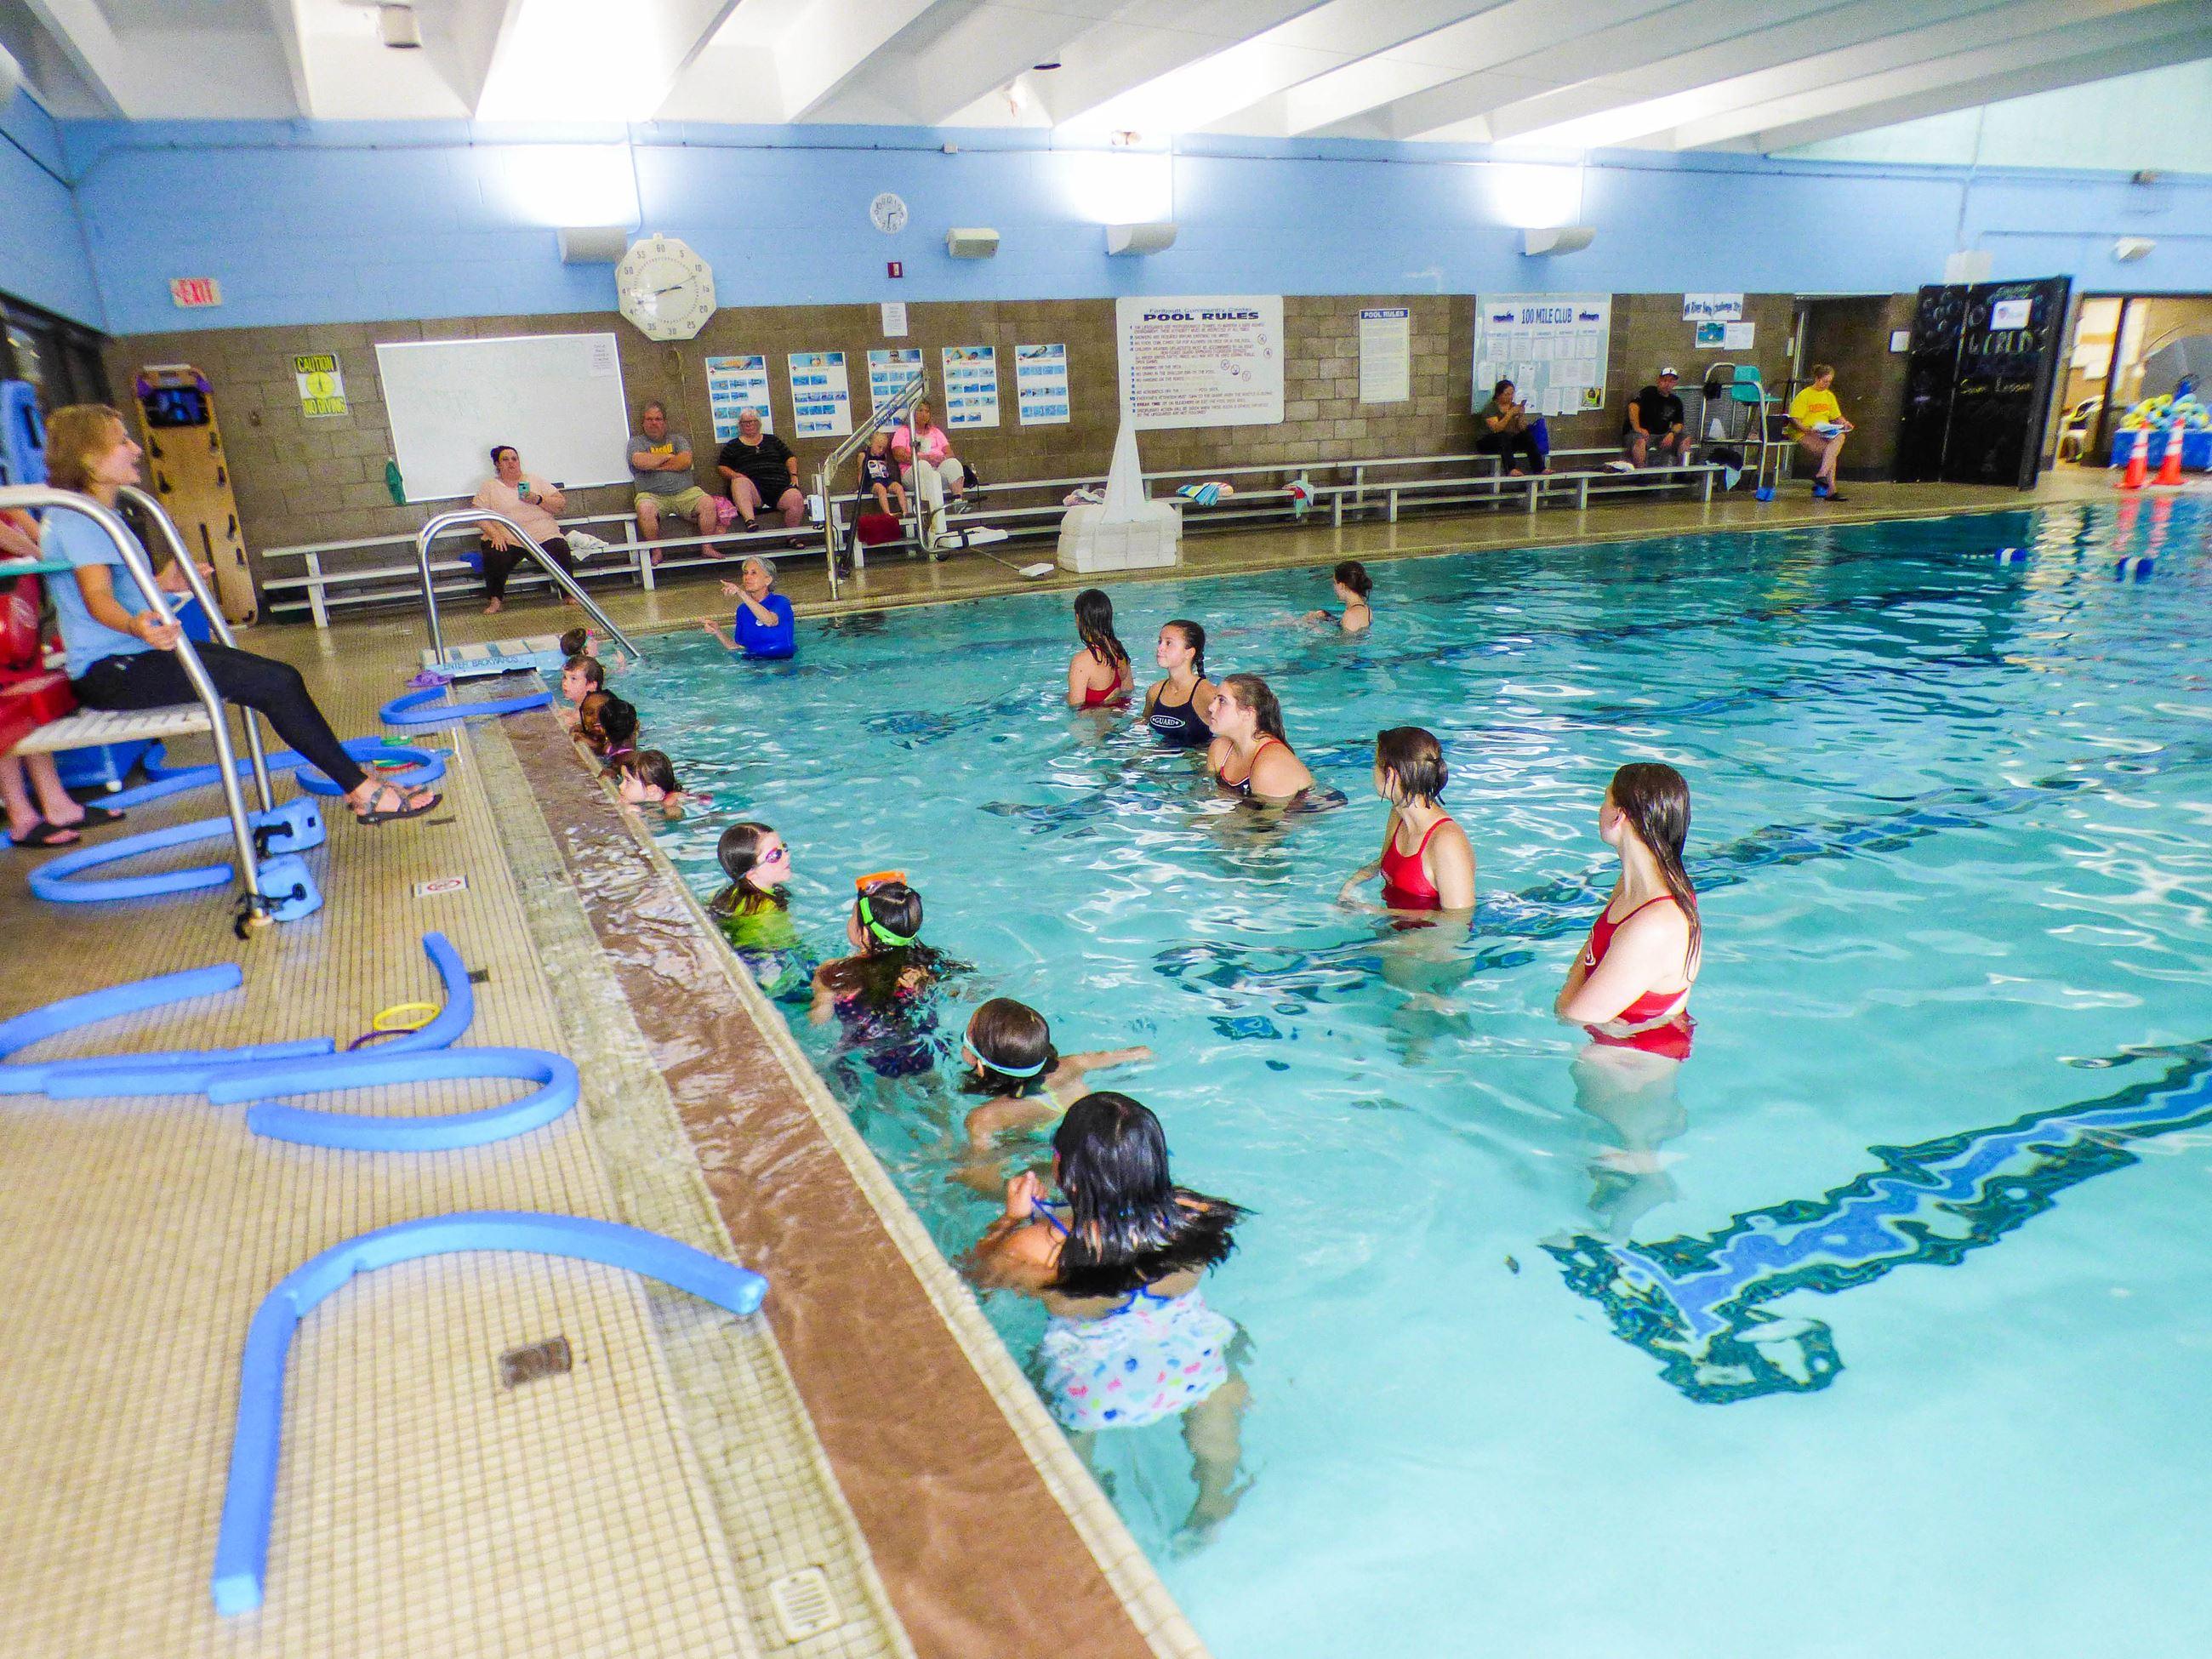 Community Center Pool | Faribault, MN